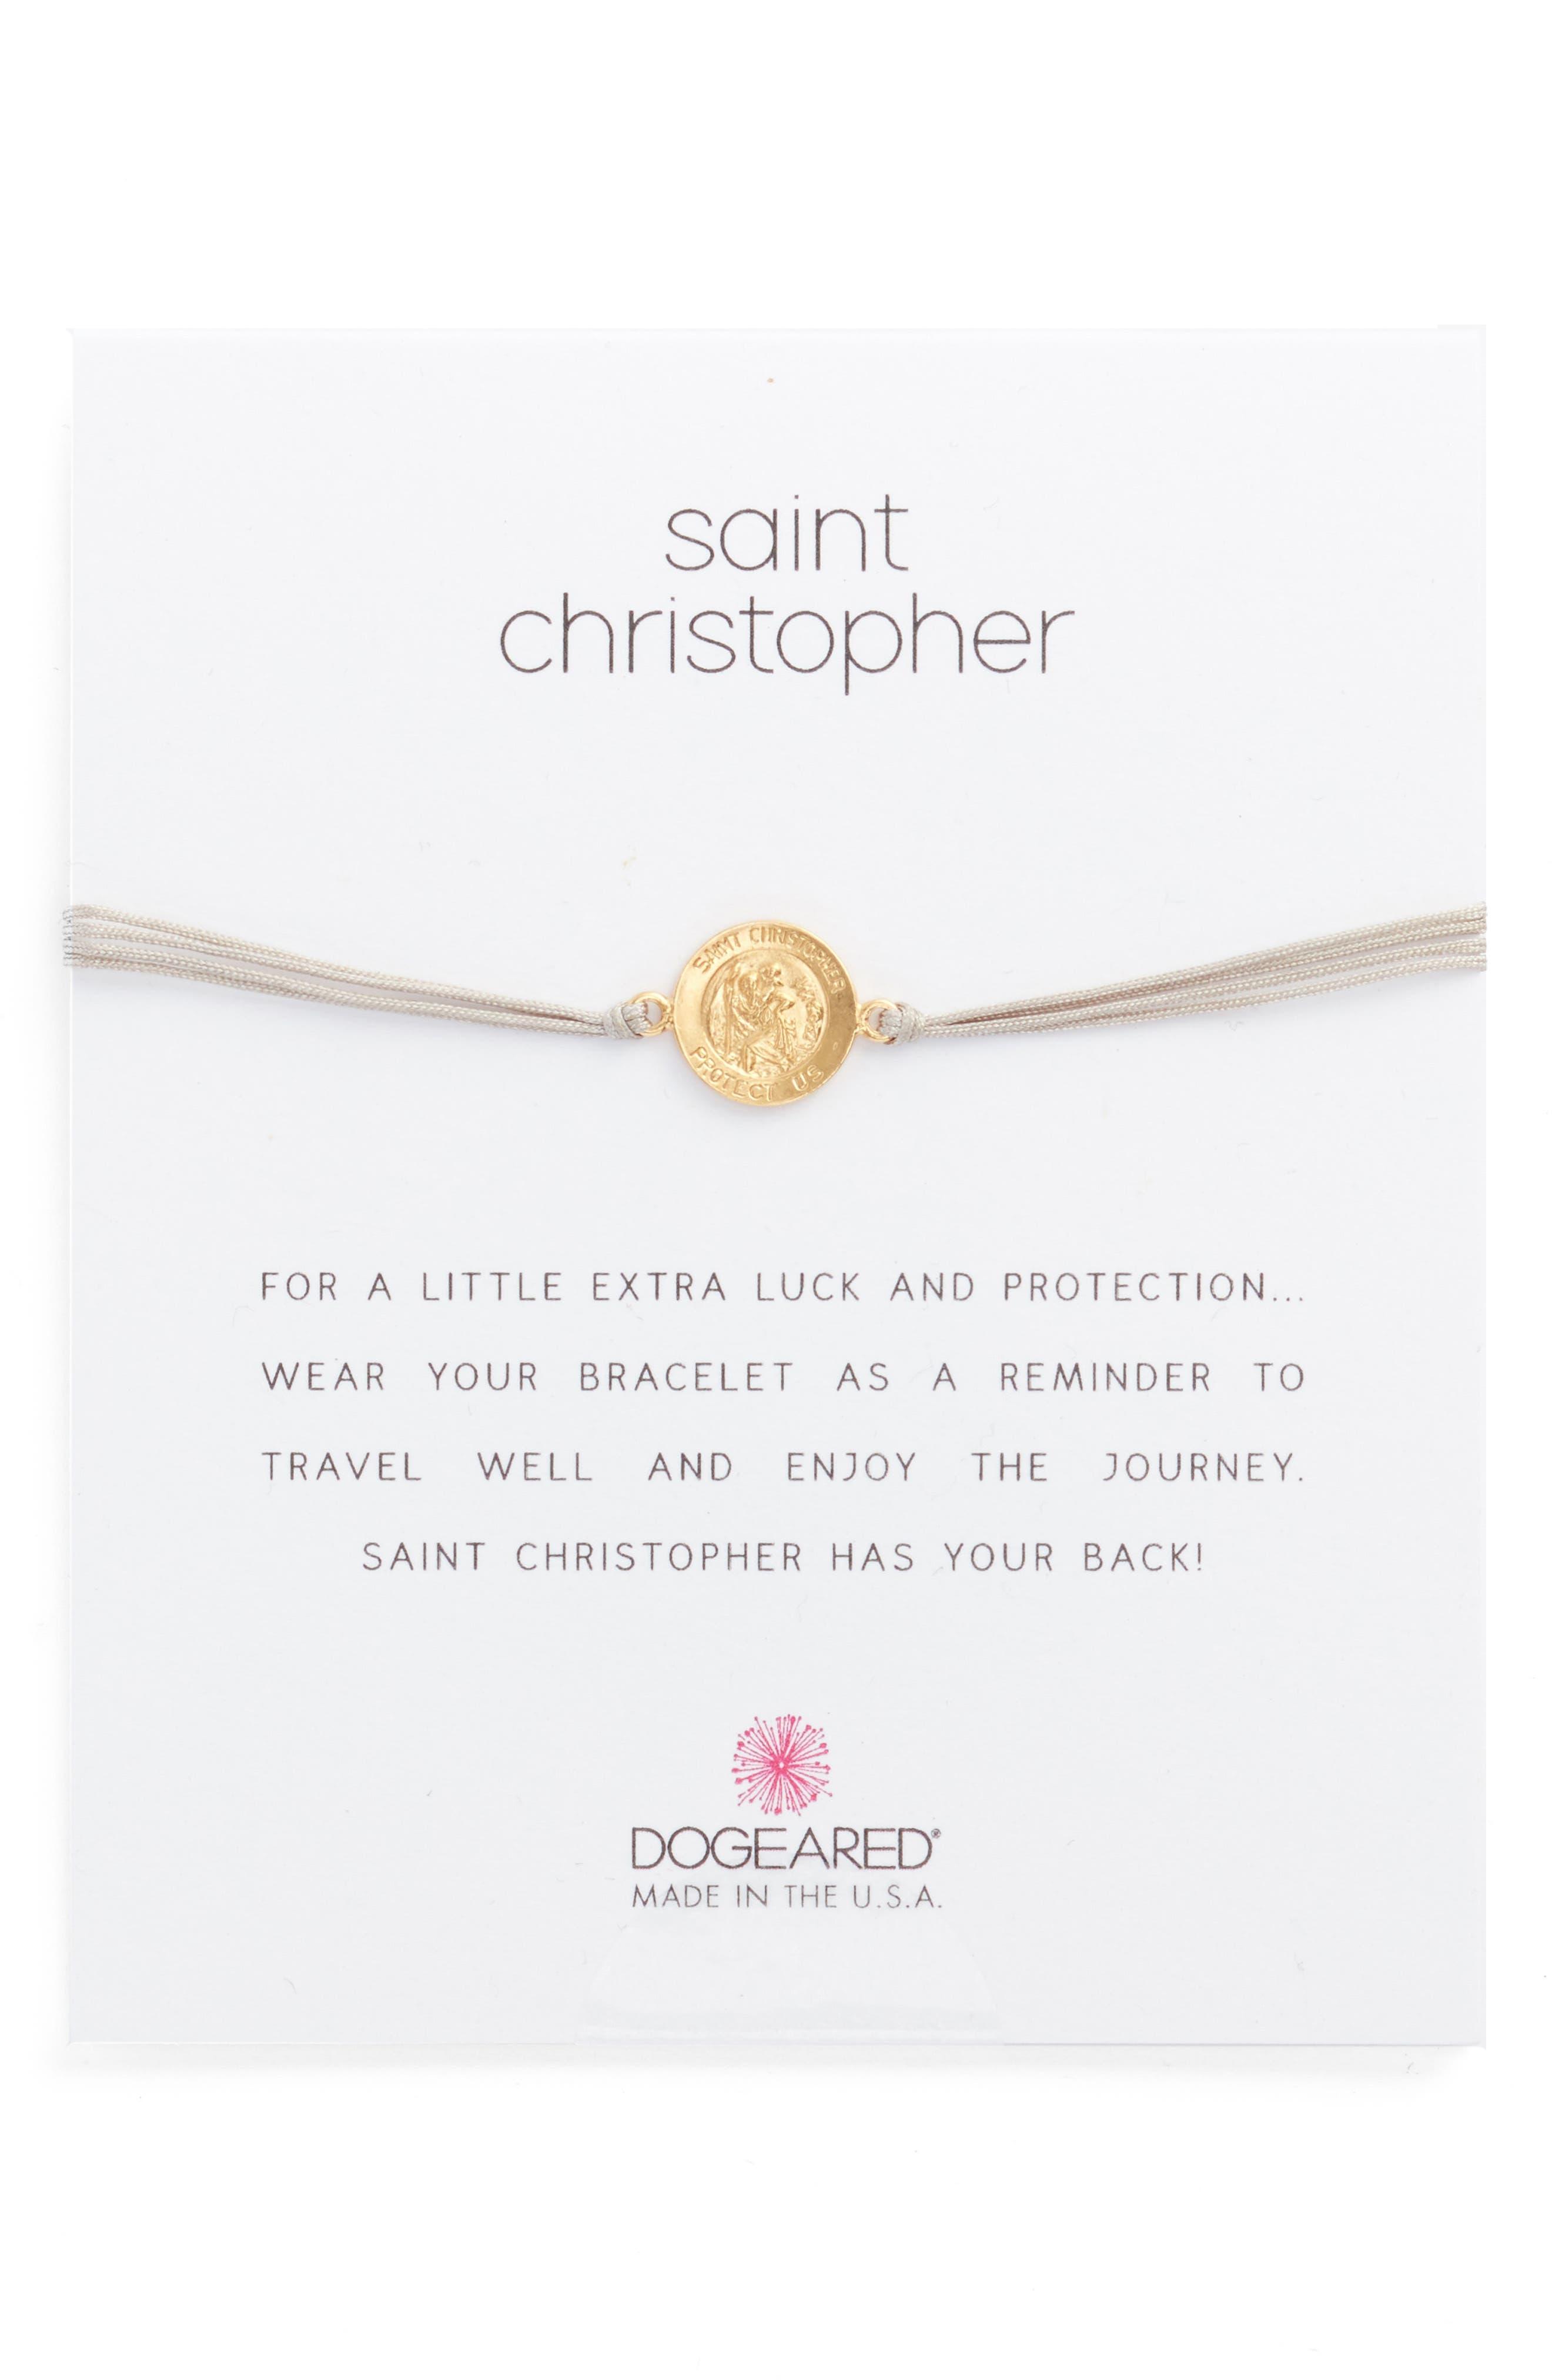 Dogeared Saint Christopher Bracelet